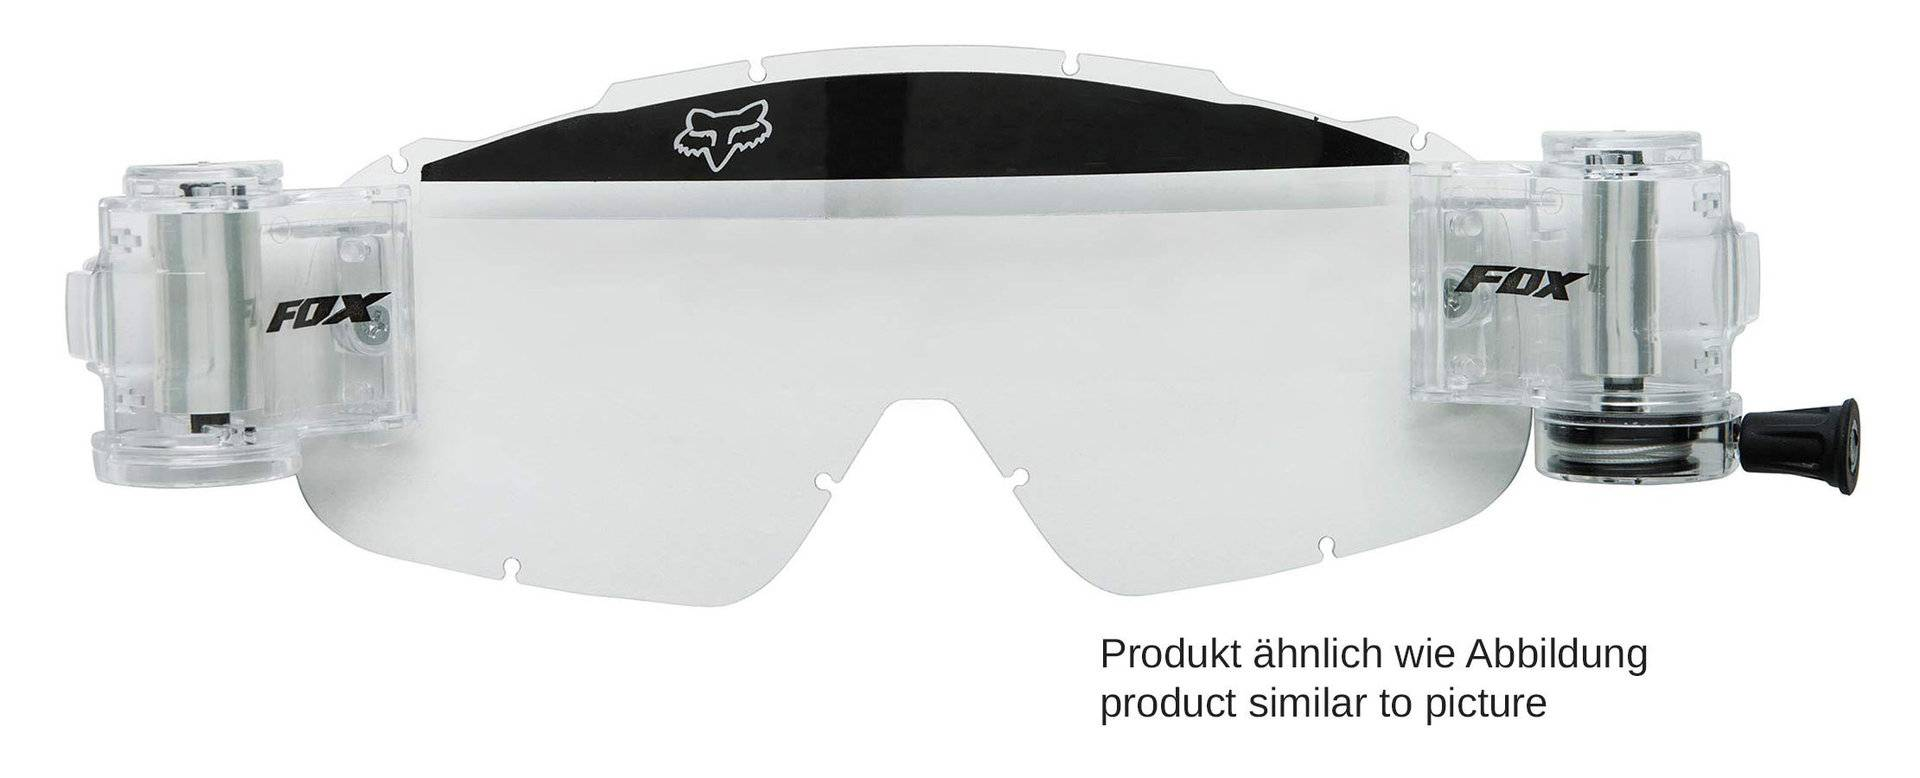 Fox Total Vision System Système de vision taille :